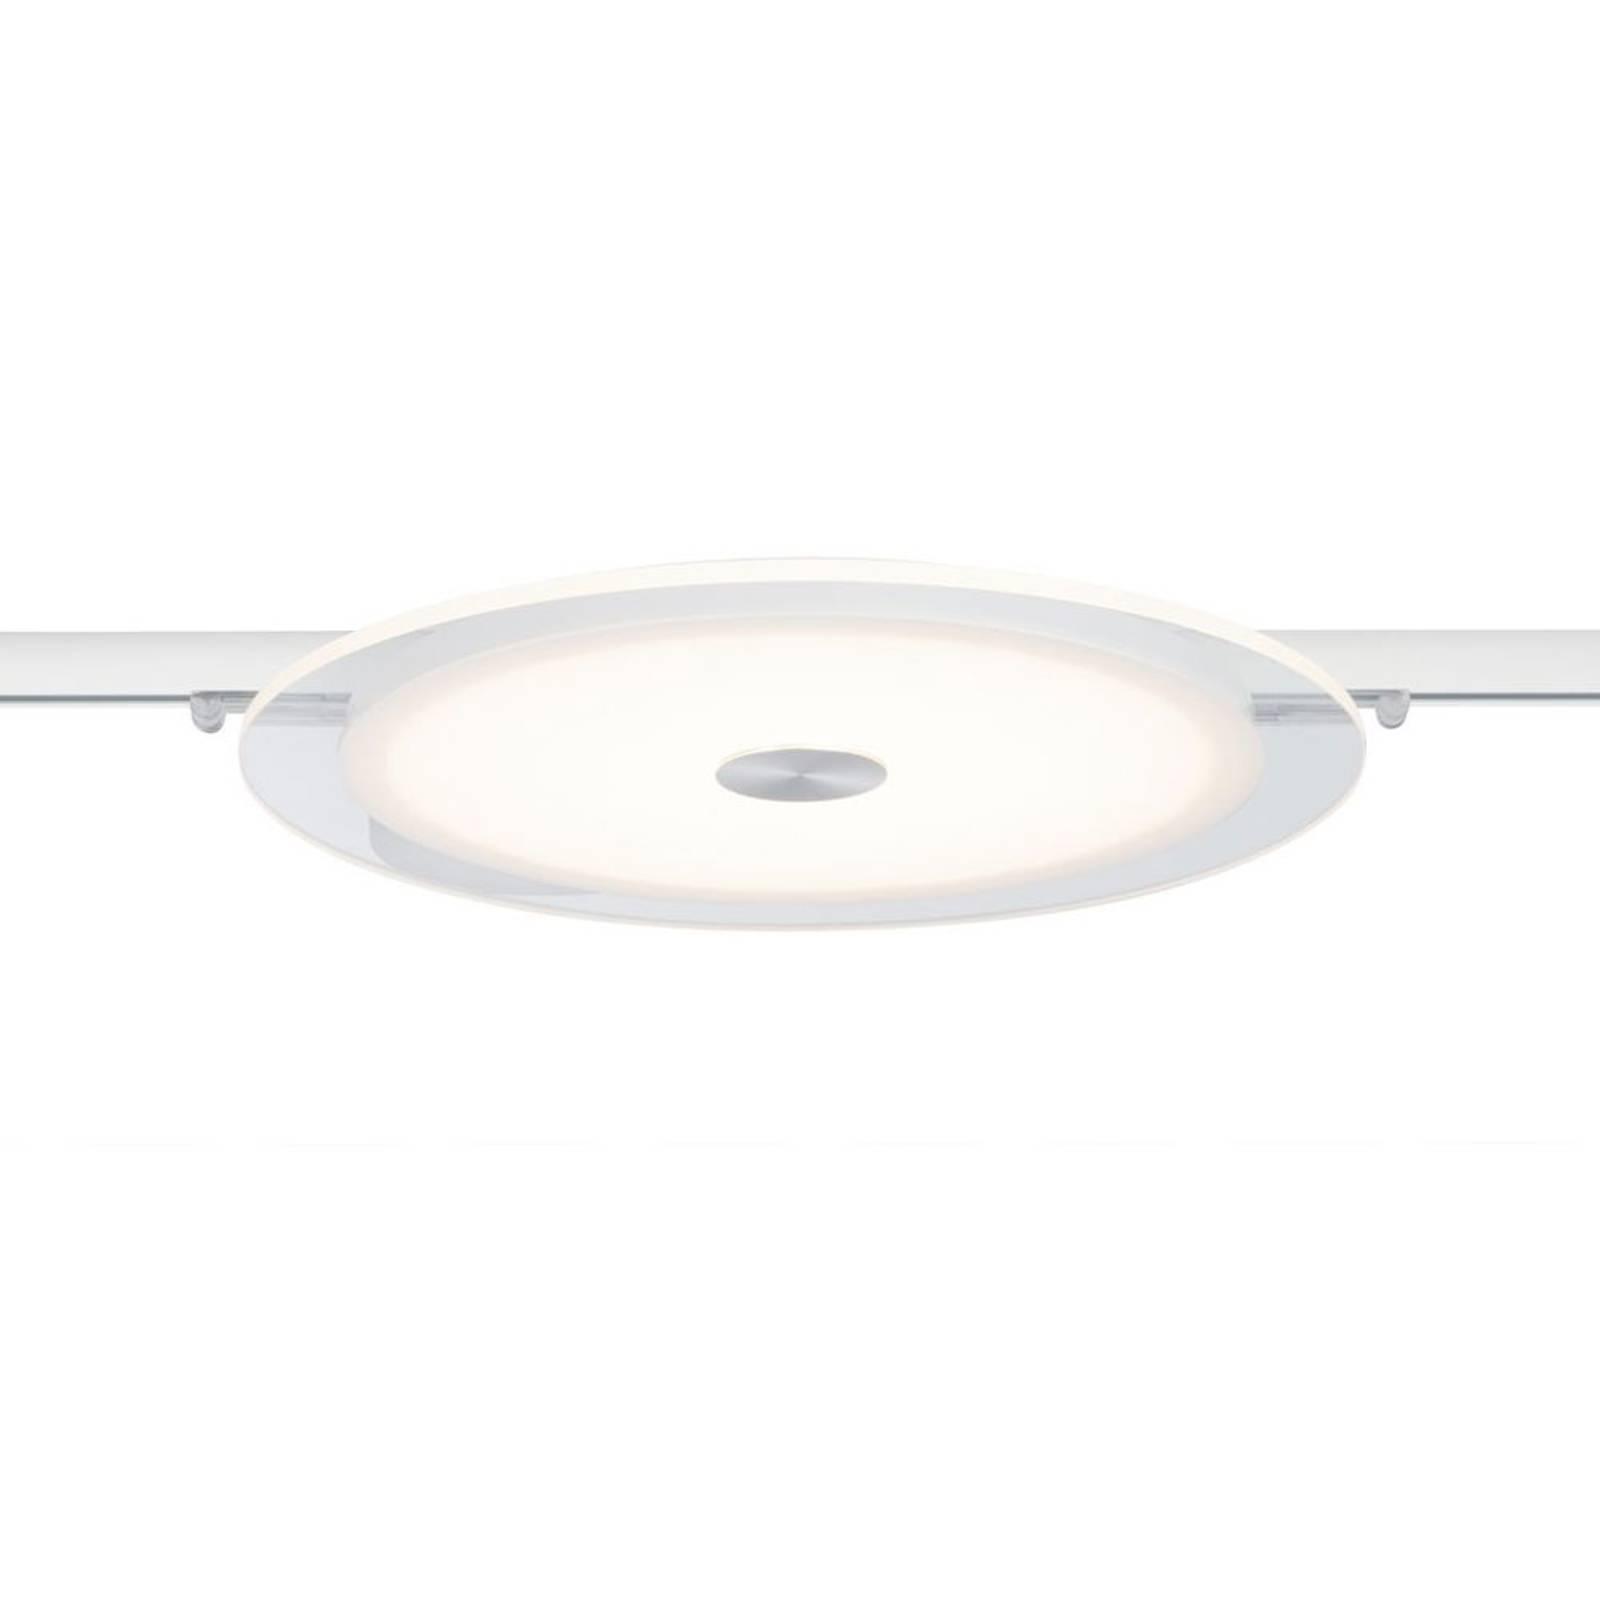 Paulmann NanoRail Luno pannello LED, bianco